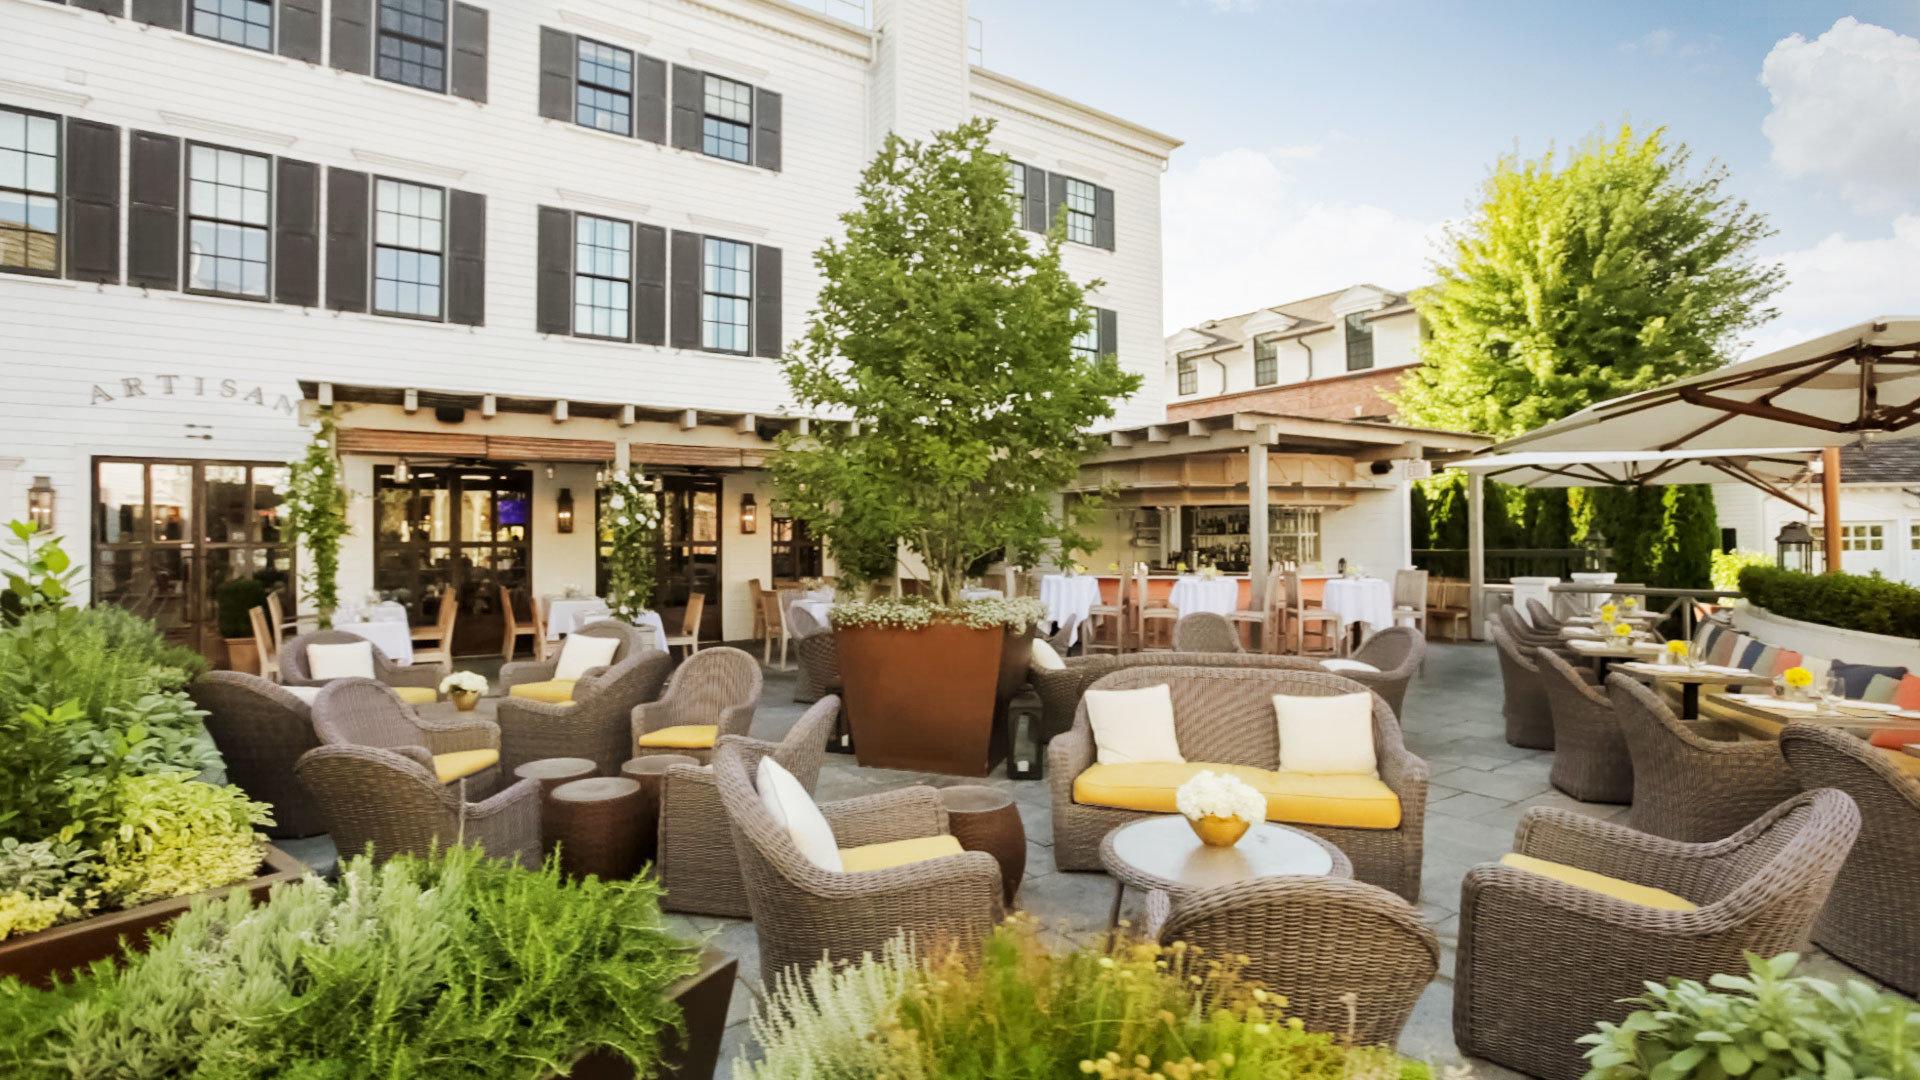 property condominium Resort plaza Courtyard restaurant